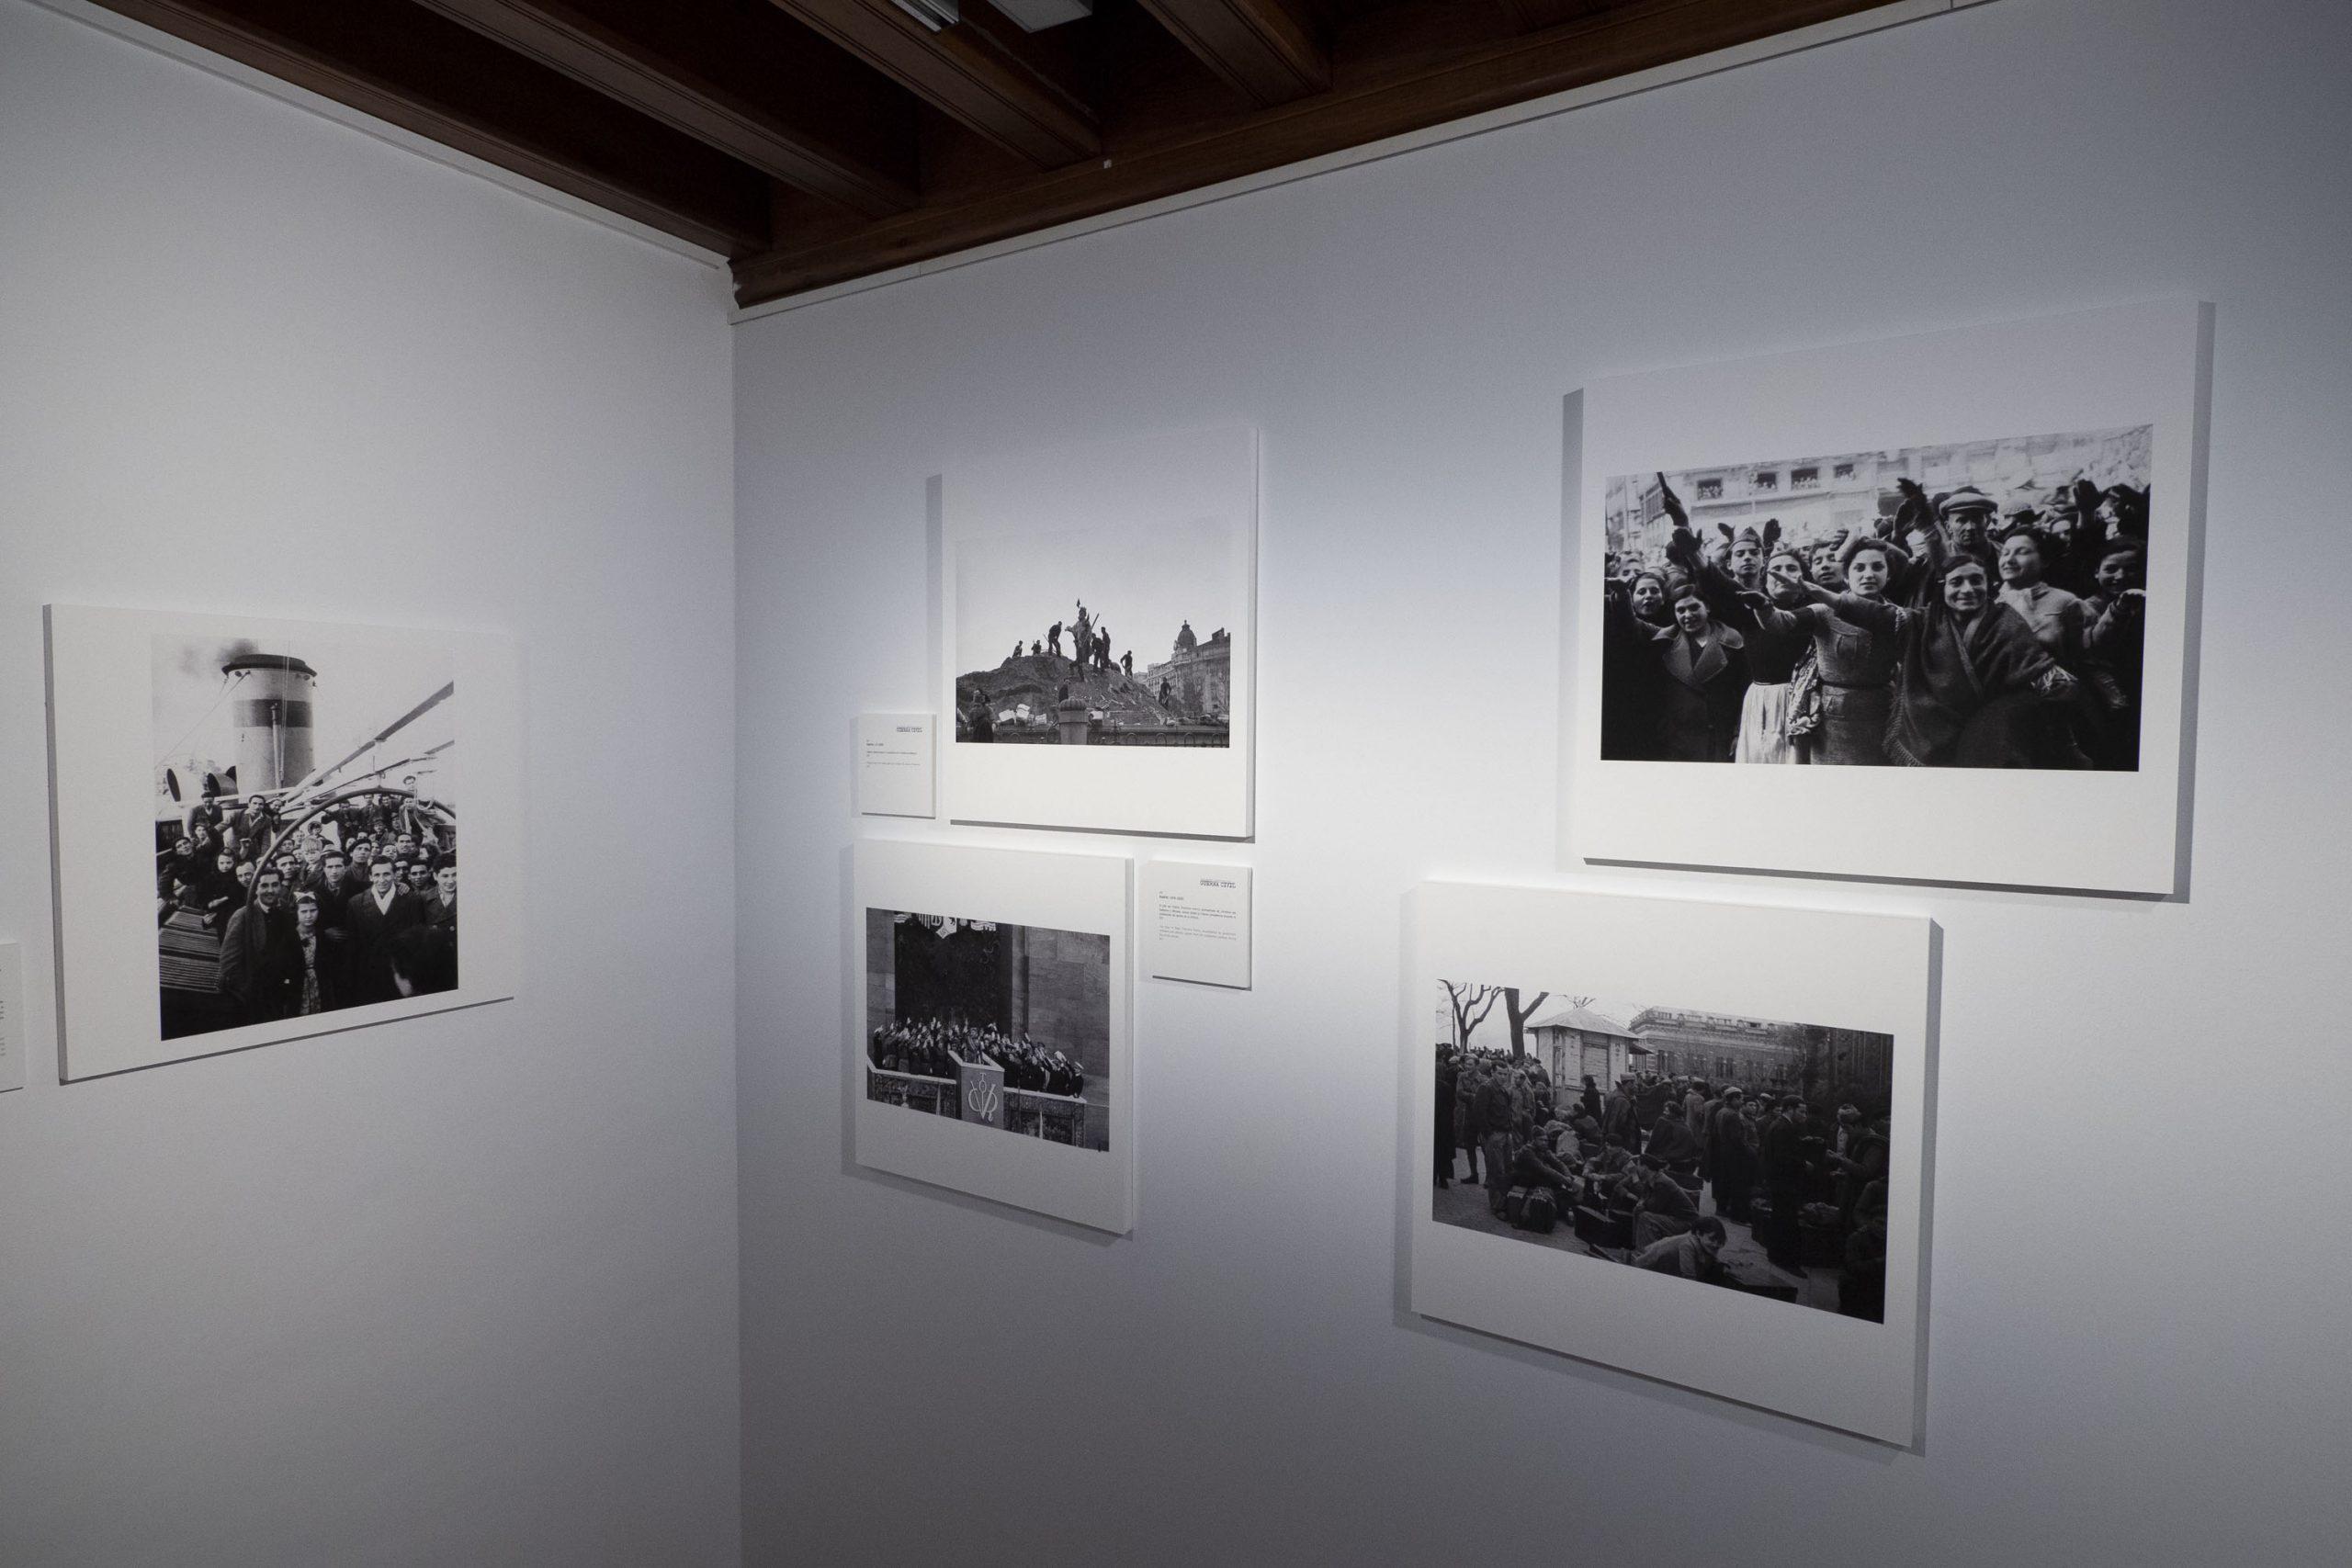 cb Exposicion Imagenes Ineditas de La Guerra Civil13 scaled